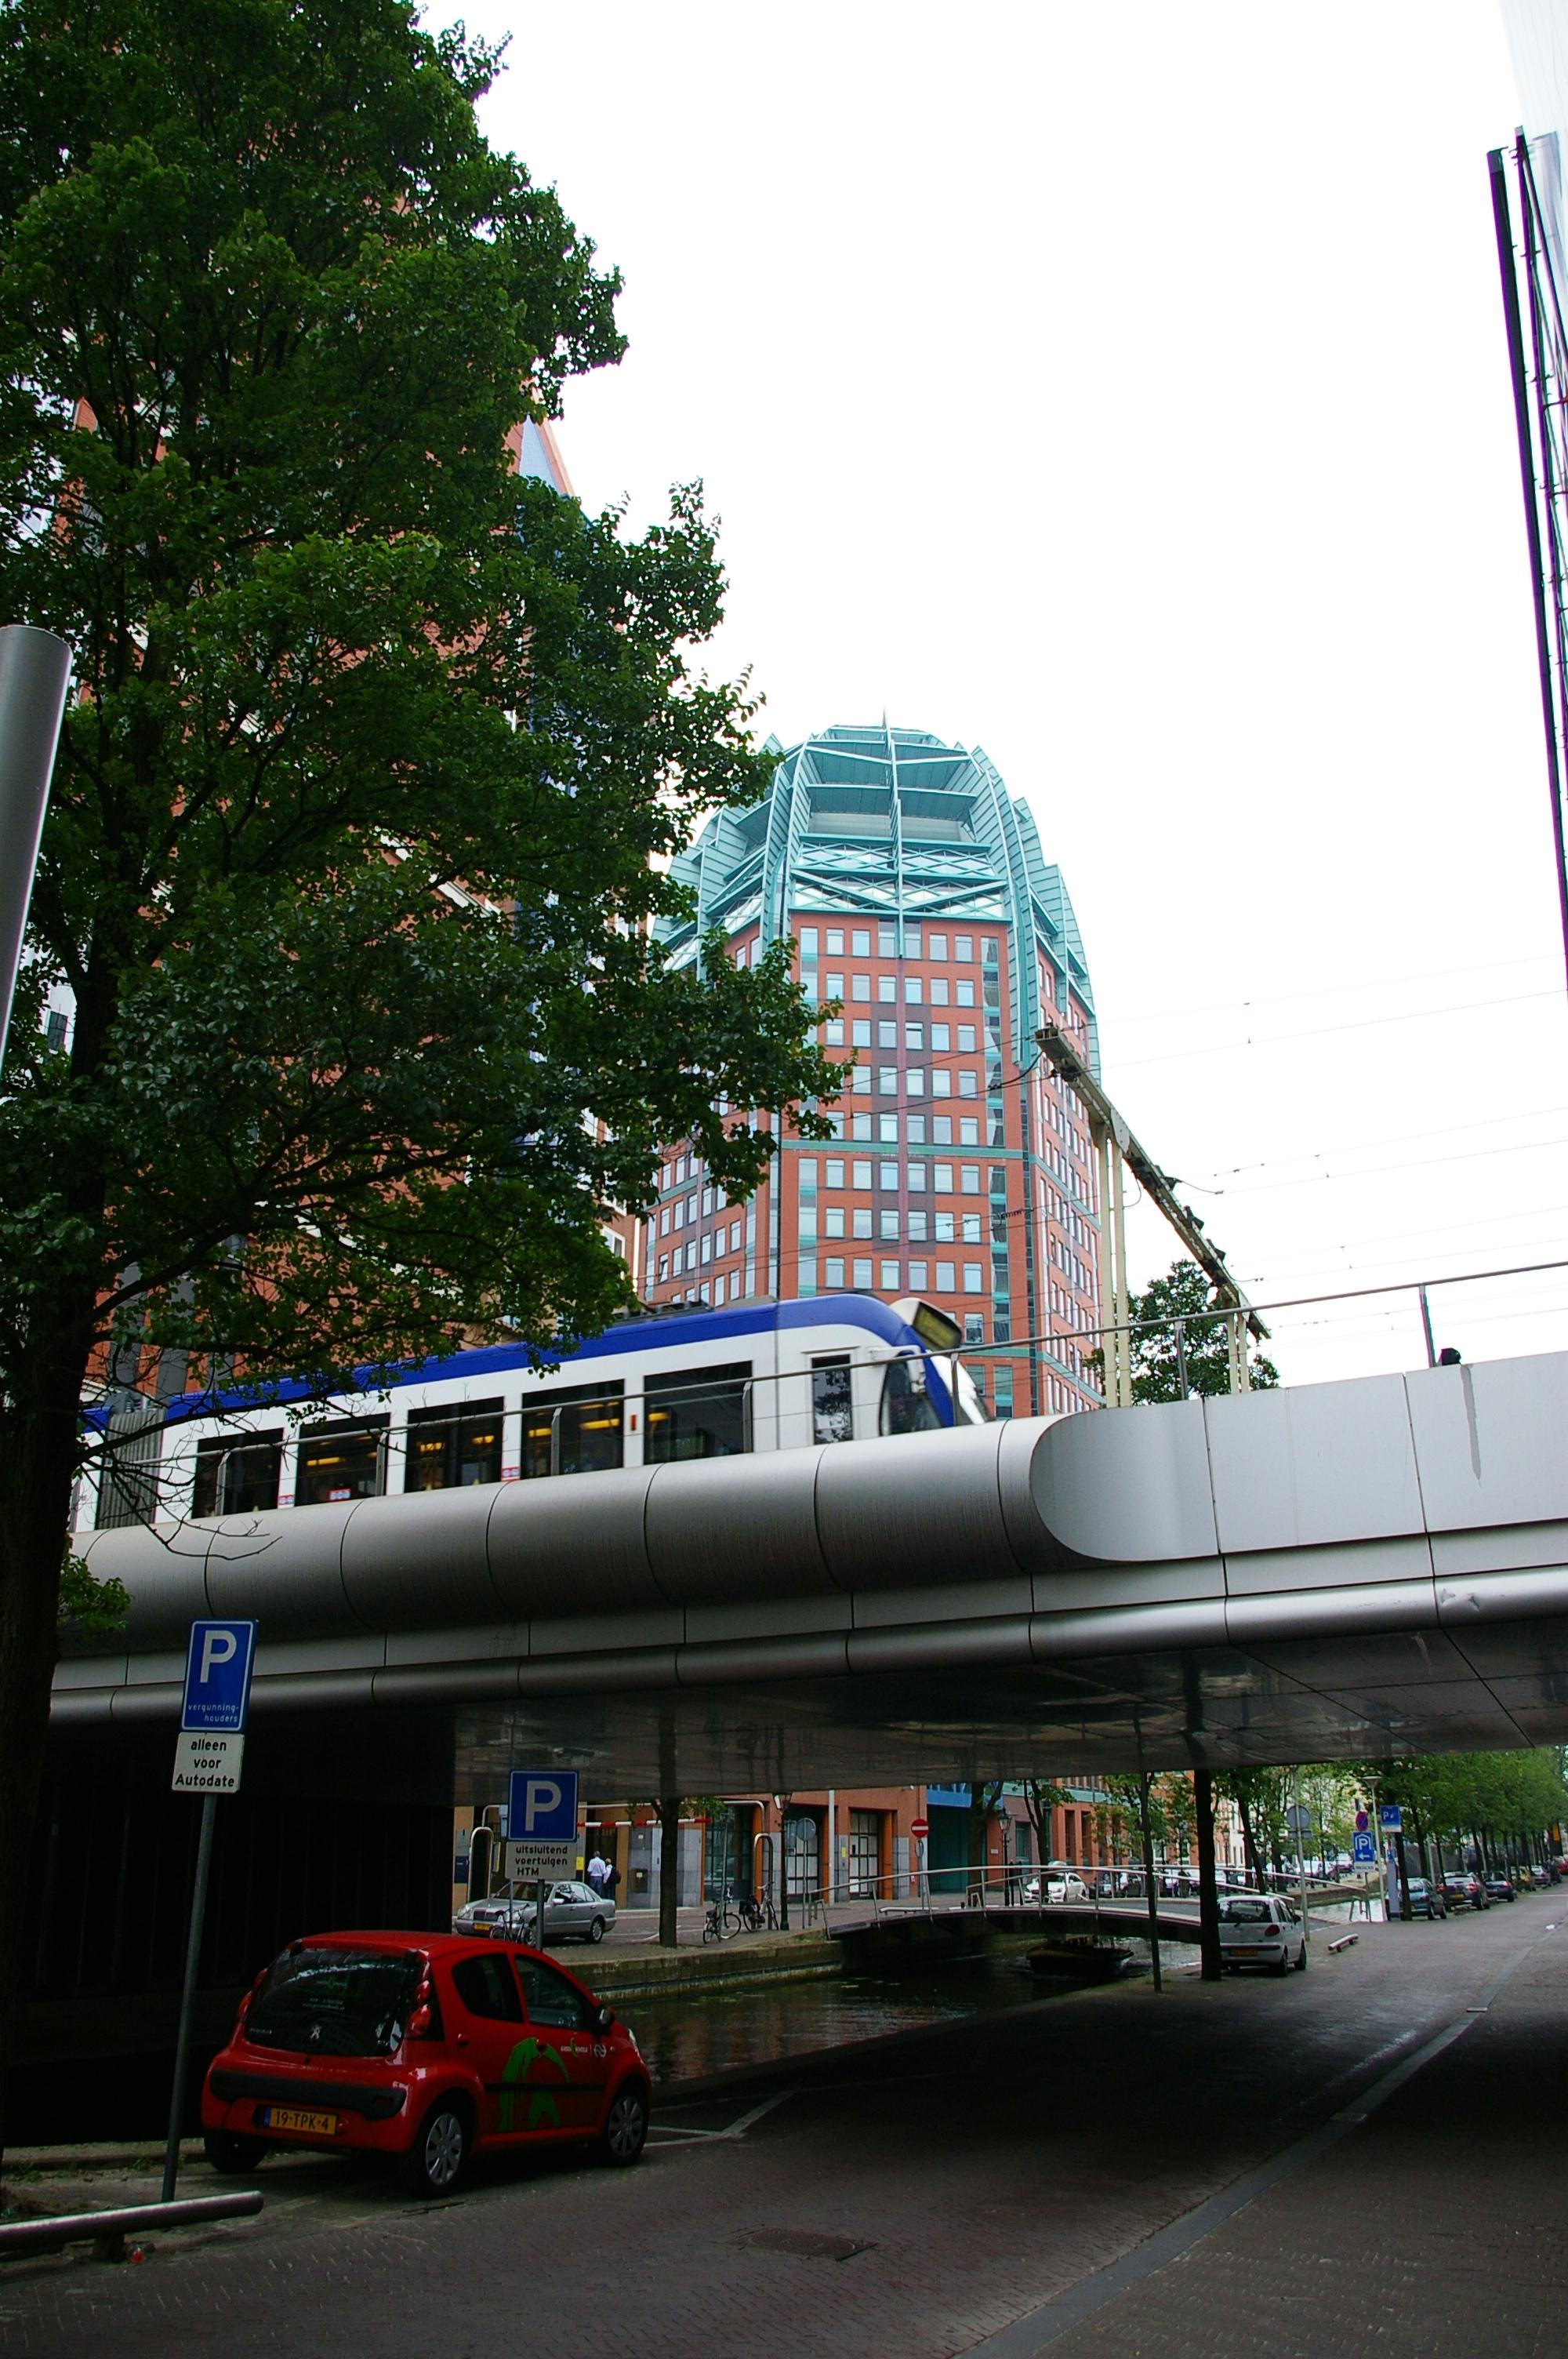 Tram-naar-station